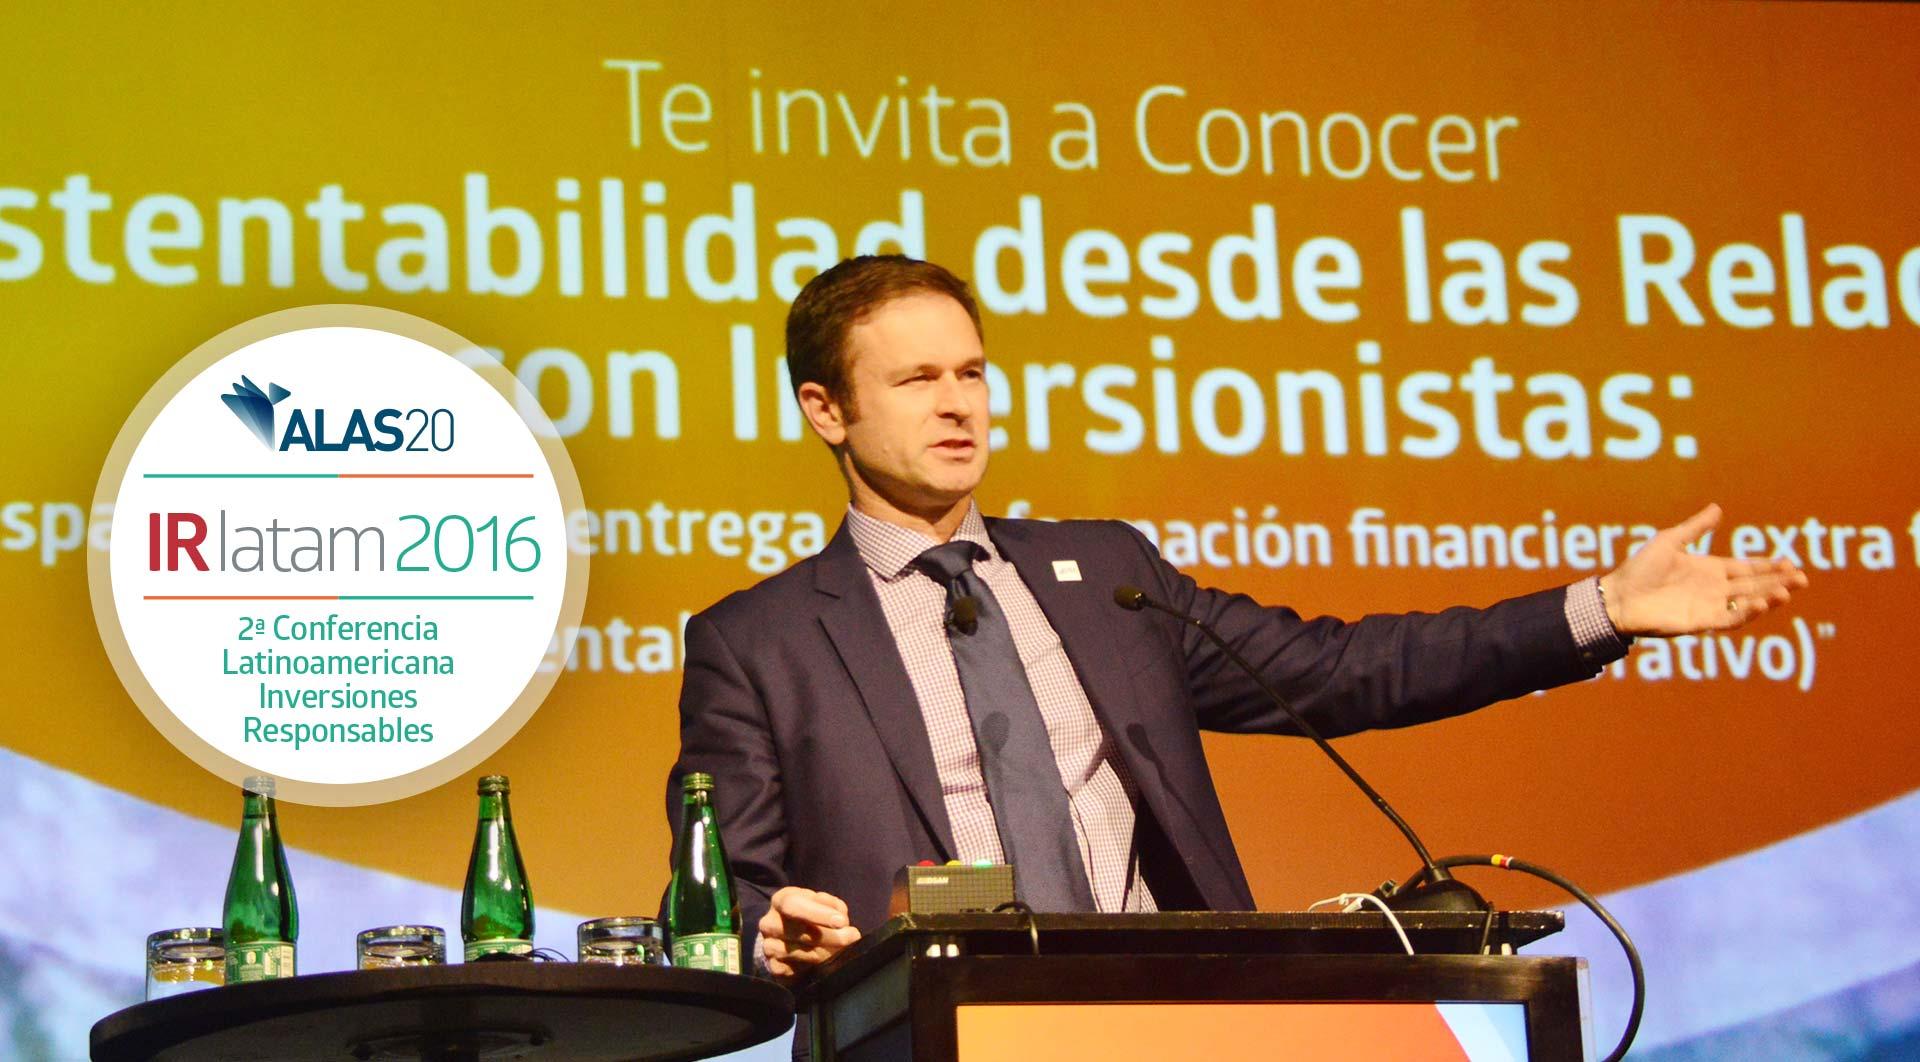 IR Latam 2016: 2ª Conferencia Latinoamericana de Inversiones Responsables